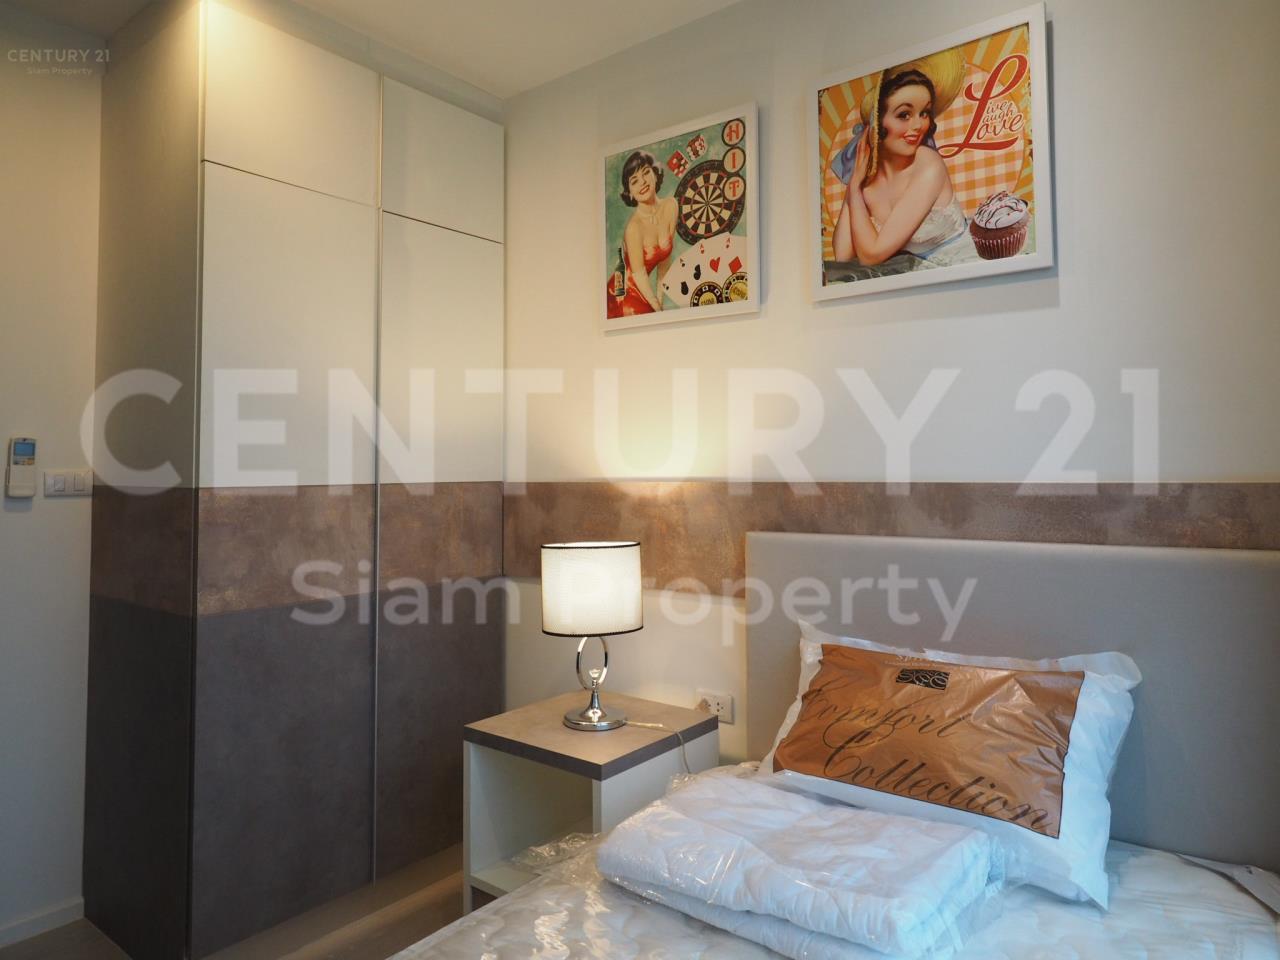 Century21 Siam Property Agency's Rhythm Sathorn - Narathiwas 3